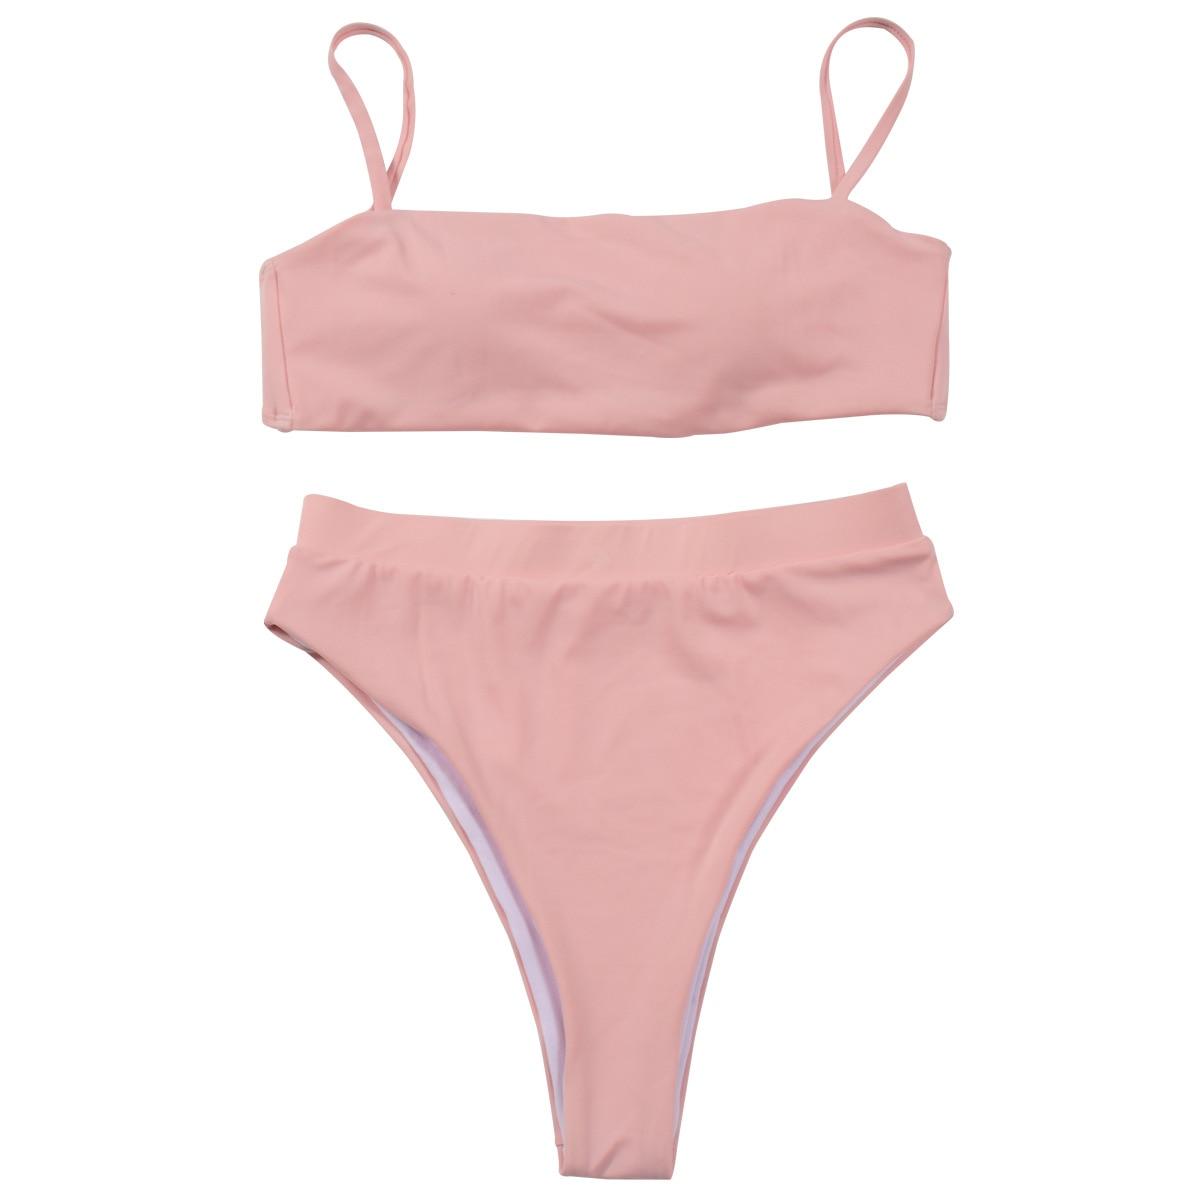 HTB1RyF2SAvoK1RjSZFwq6AiCFXa3 Micro Bikini Women Bandage Swimwear Swimsuit Bathing Suit Solid Bikini Push Up Beach Wear Maillot De Bain Brazilian Bikini